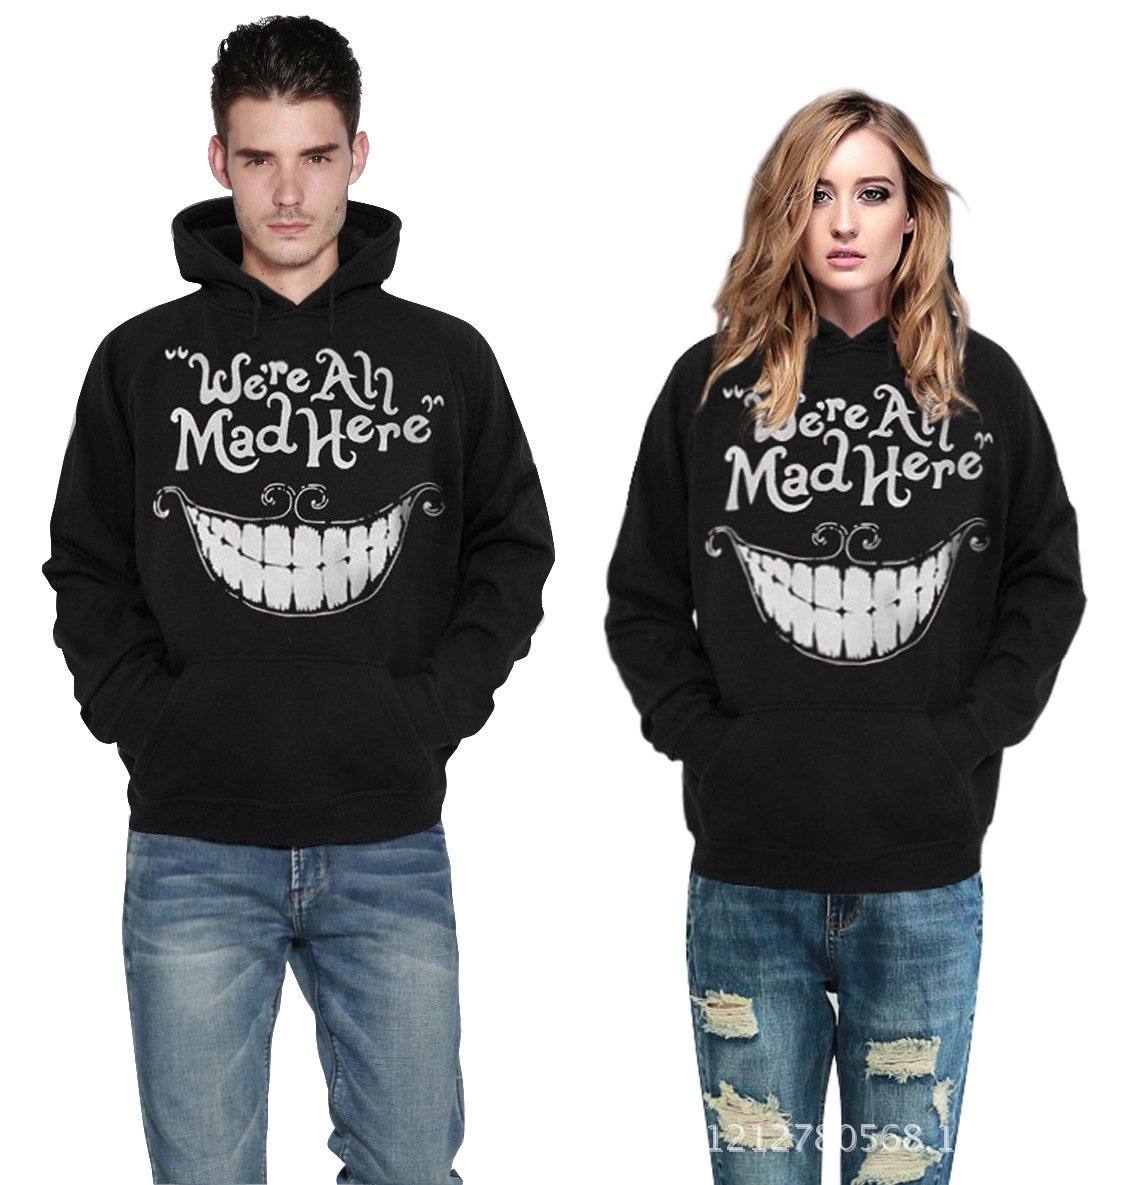 Cheshire Cat Smile 3D Digital Printing Cap Baseball Jacket Hooded Sweatshirts Casual Hoodies Lovers Pullovers(China (Mainland))